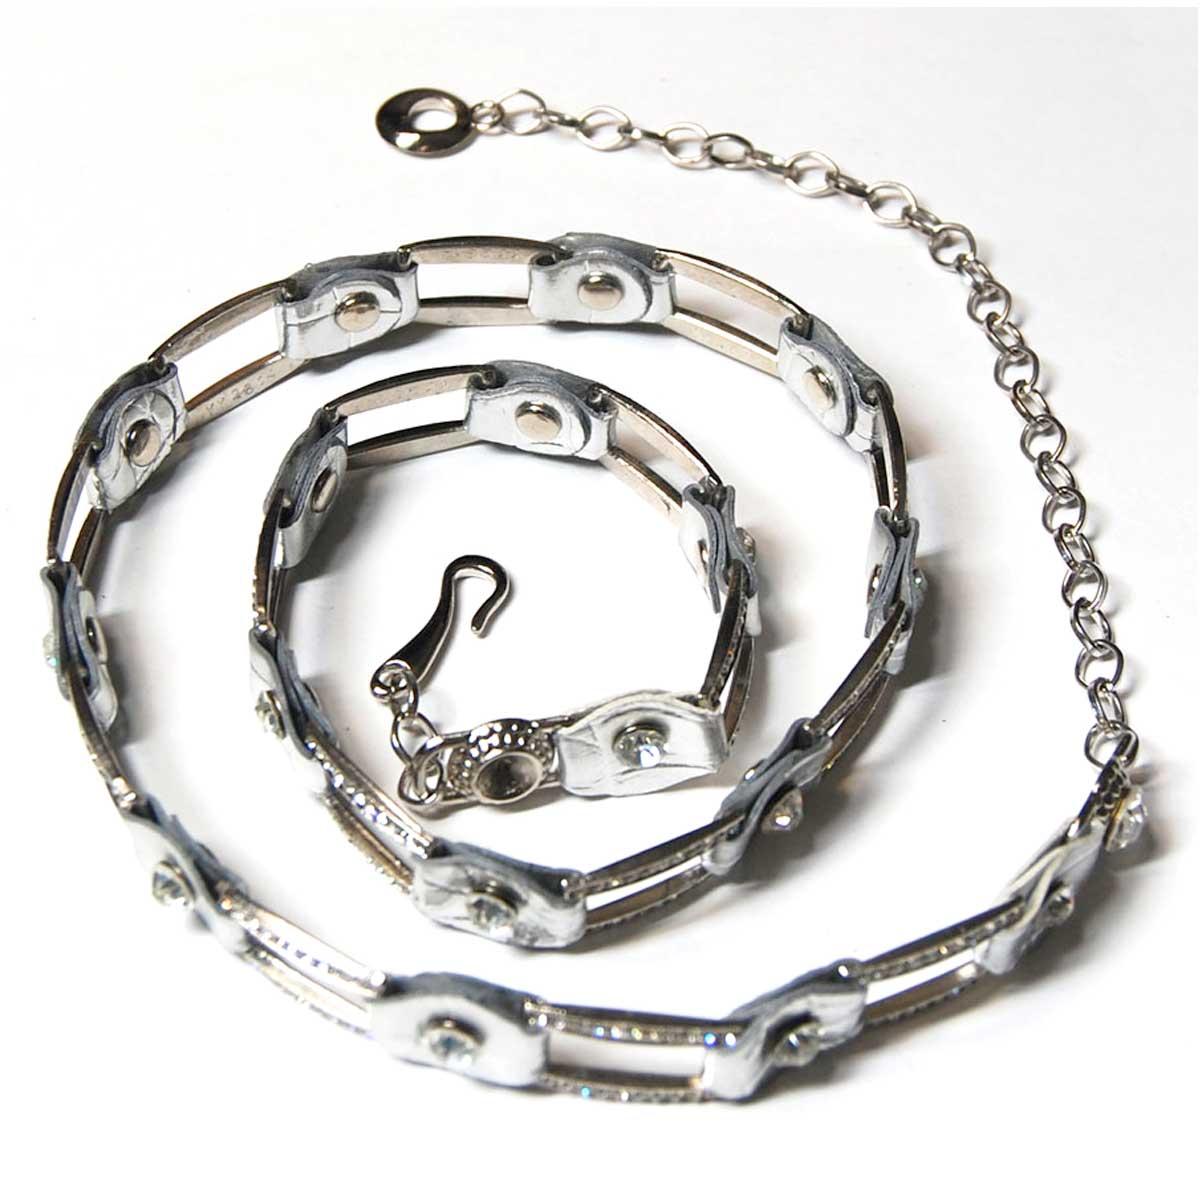 Belts - Metal & Chain*